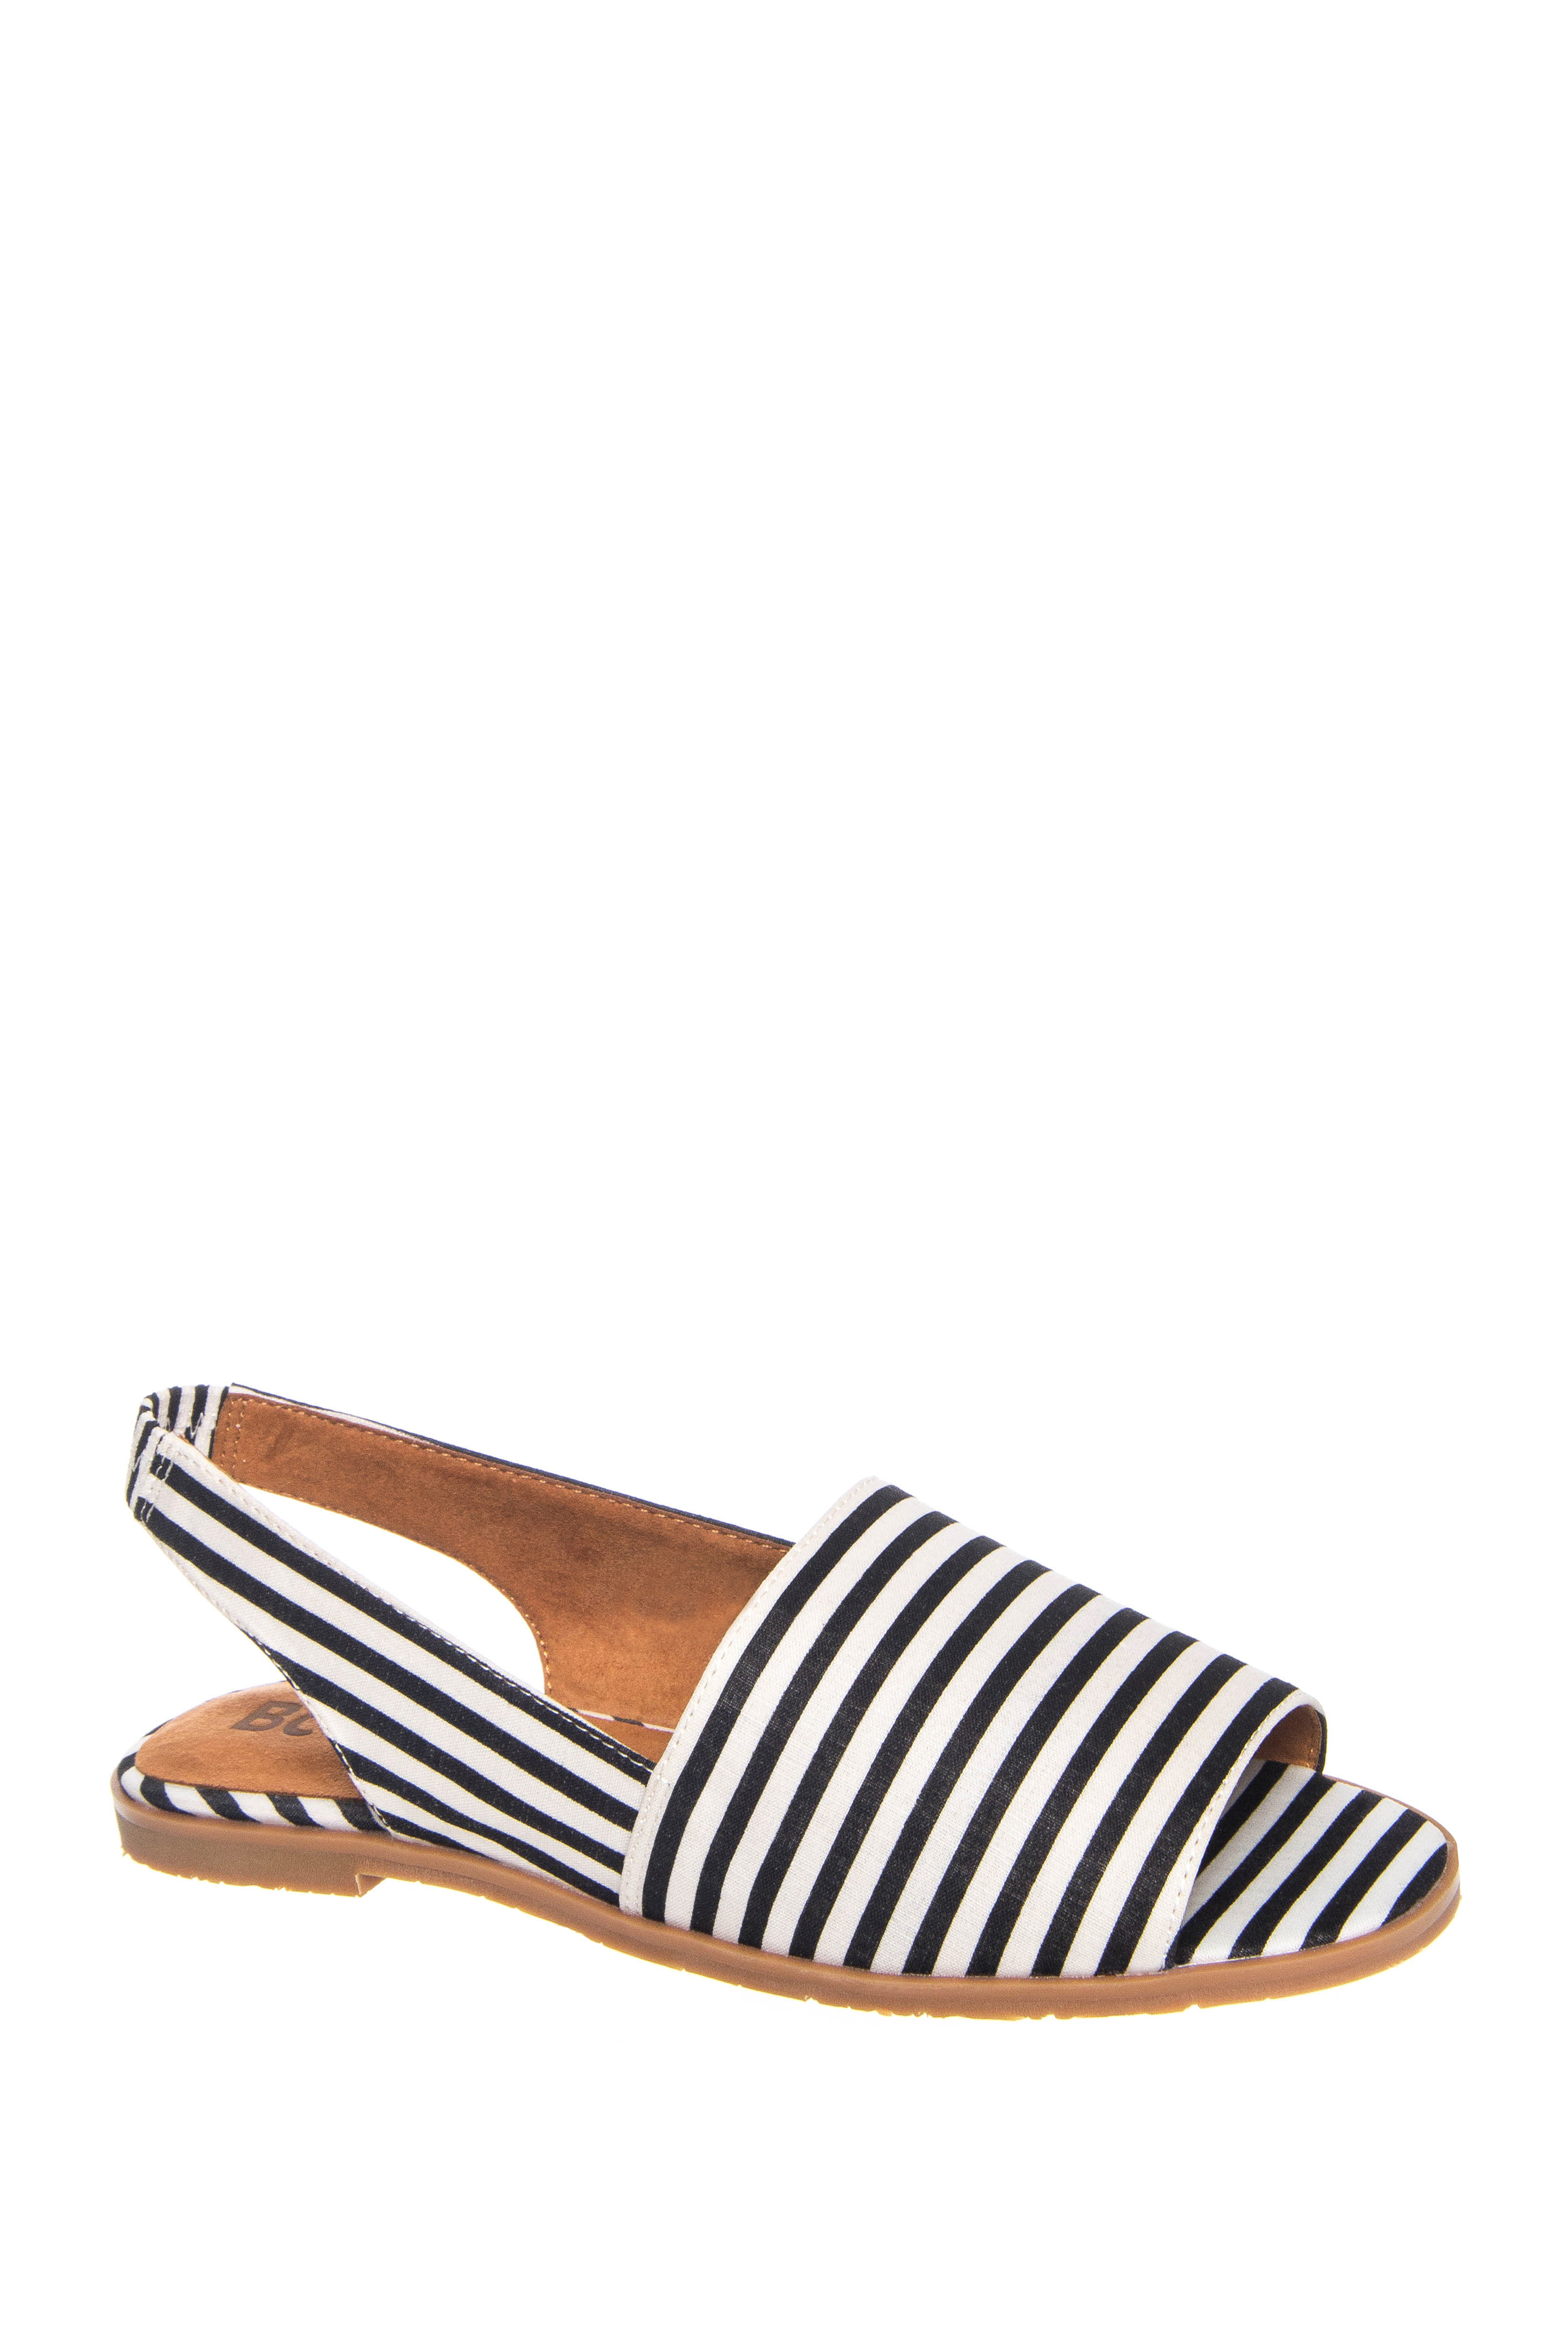 BC Footwear Shot In The Dark Peep Toe Slingback Flats - Black / White